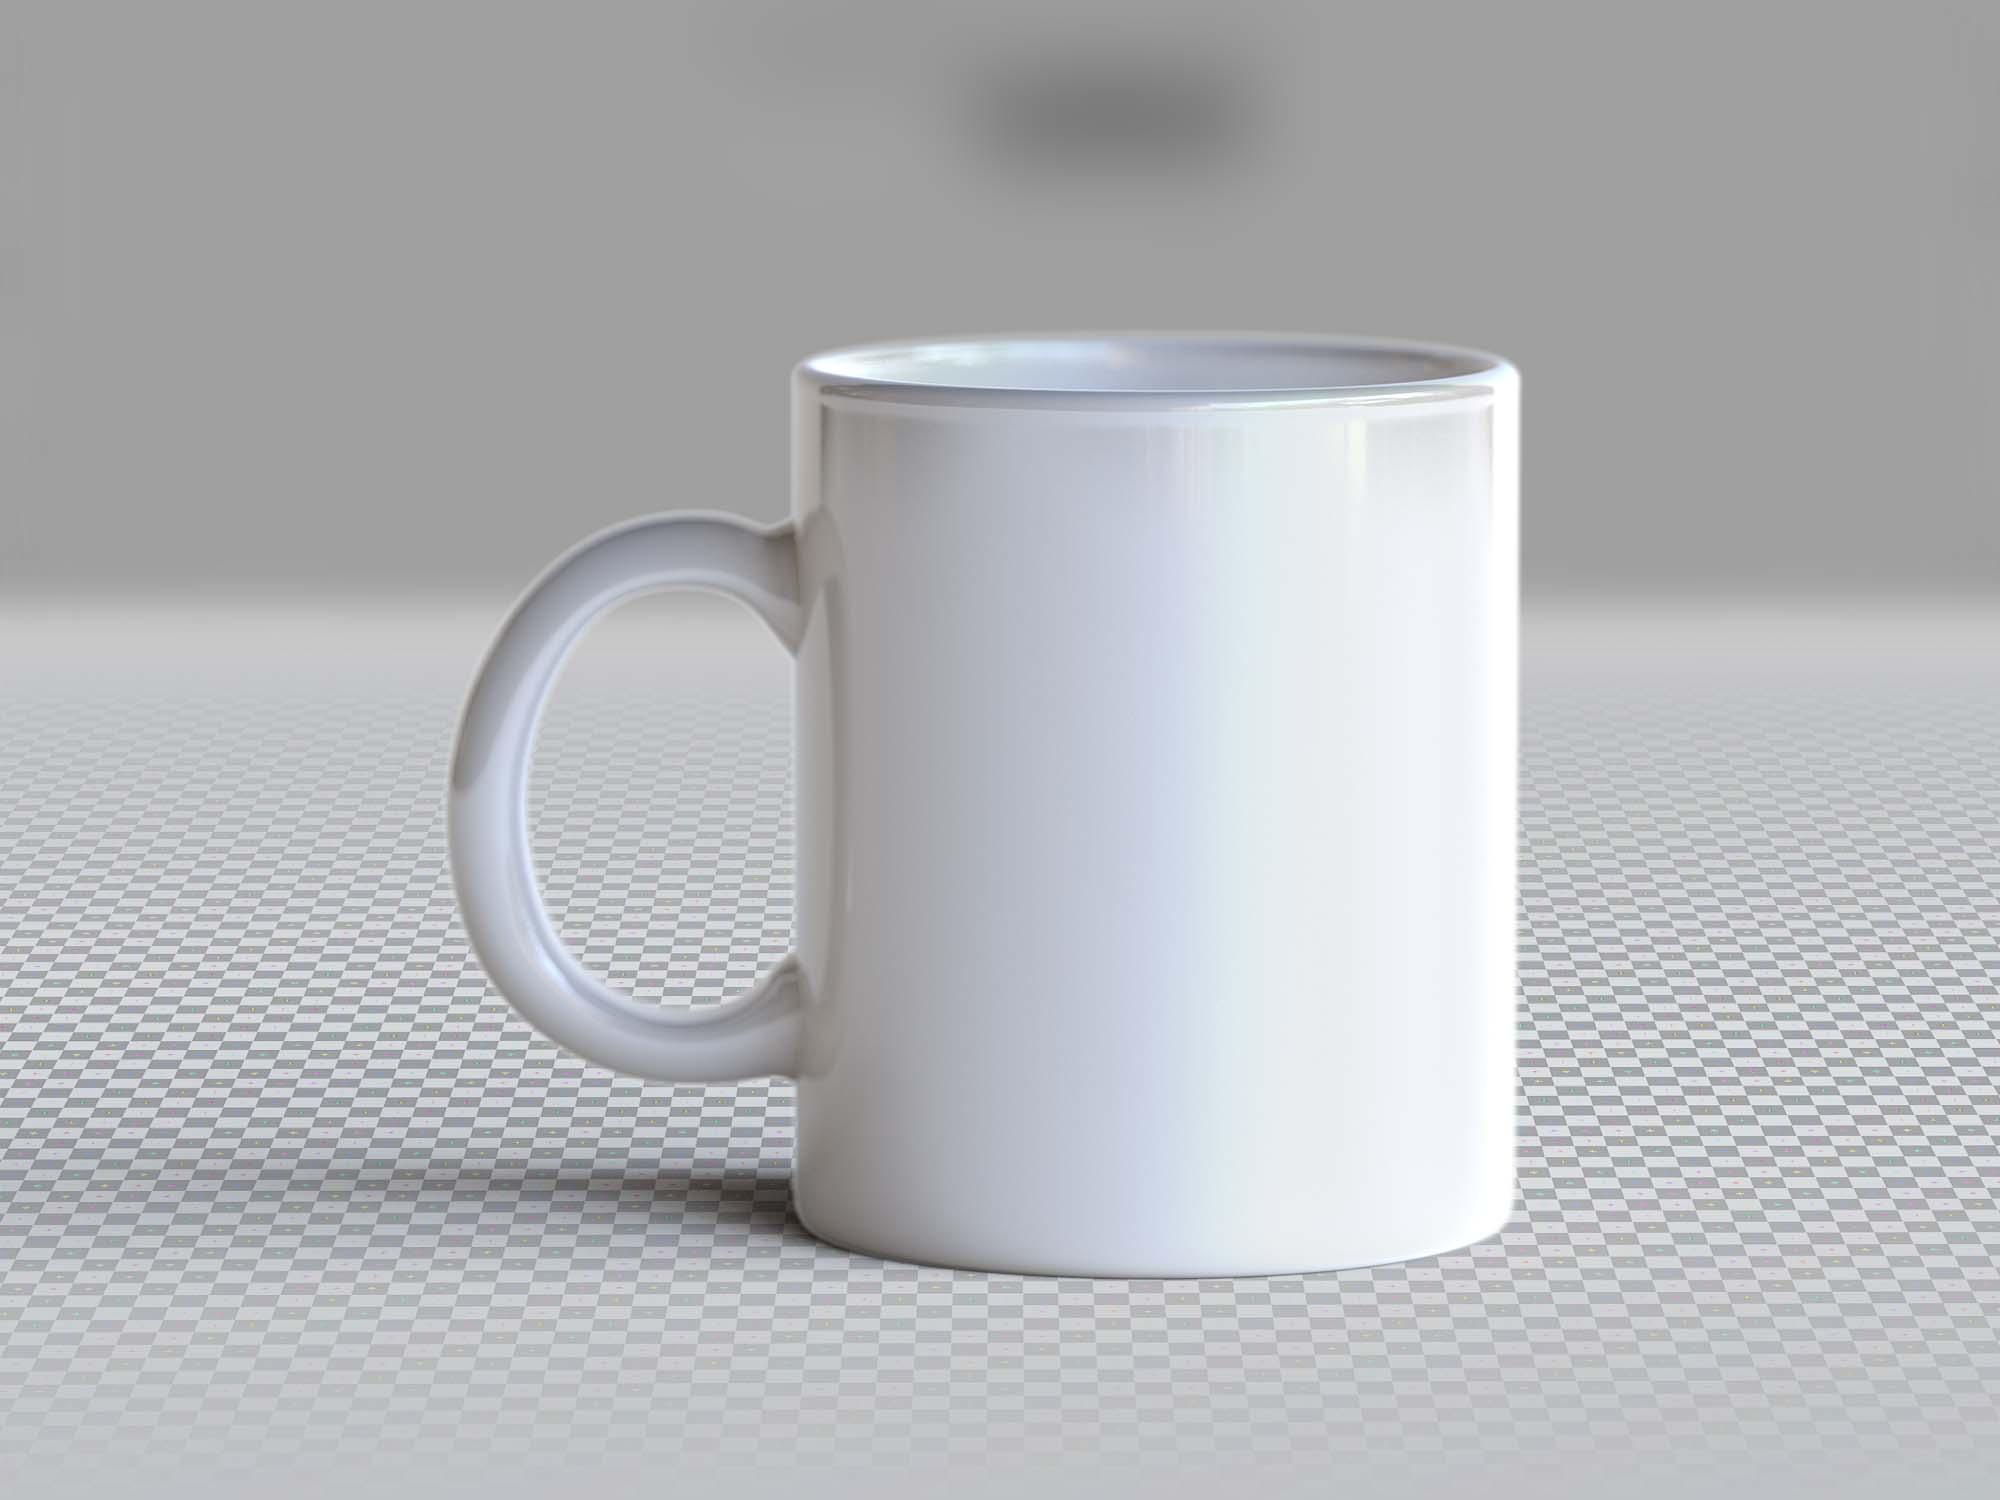 Photo-realistic Mug Mockup 2